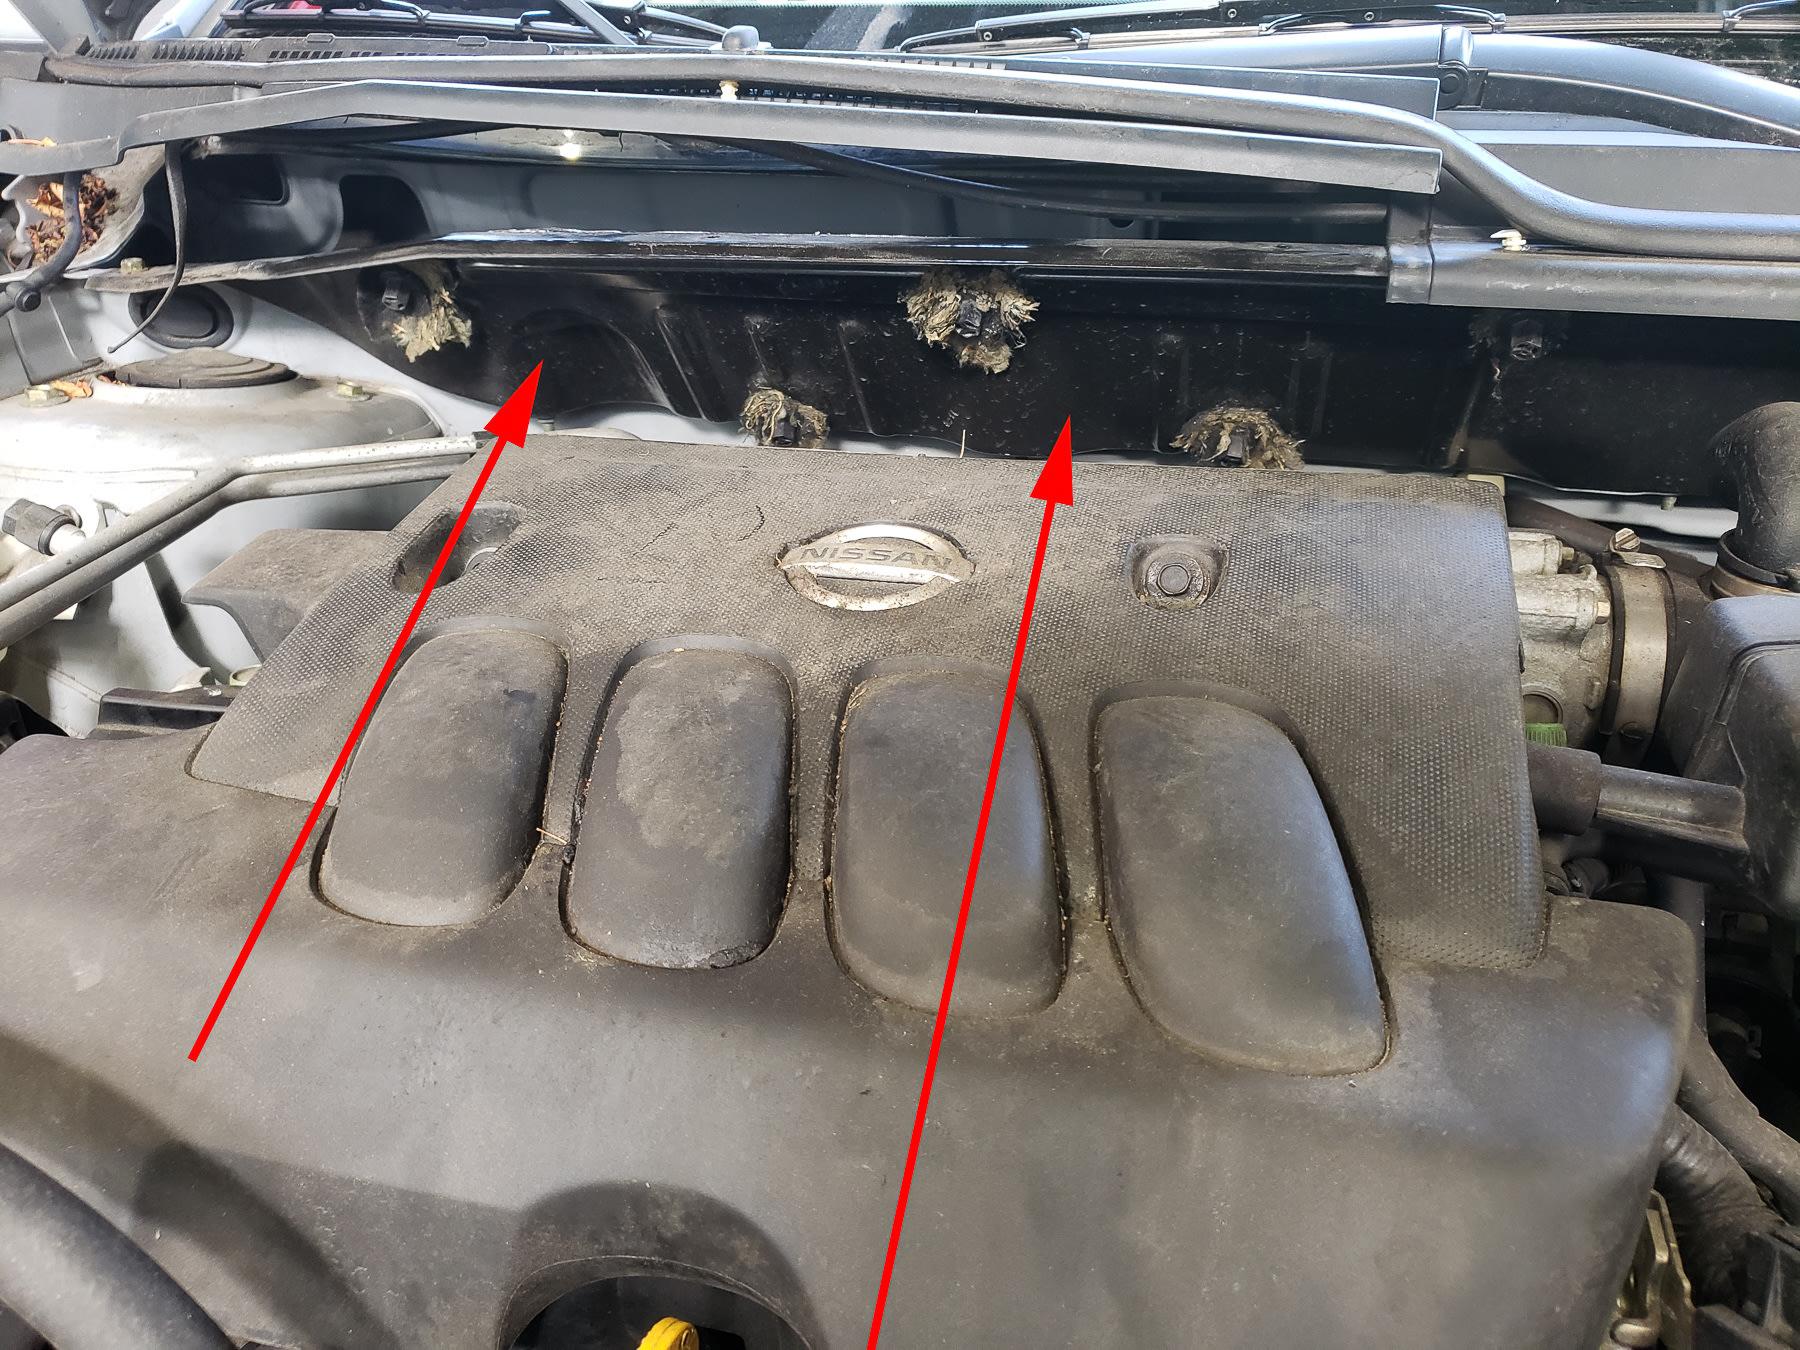 2007 Nissan Sentra Heater Blower Motor Replacement